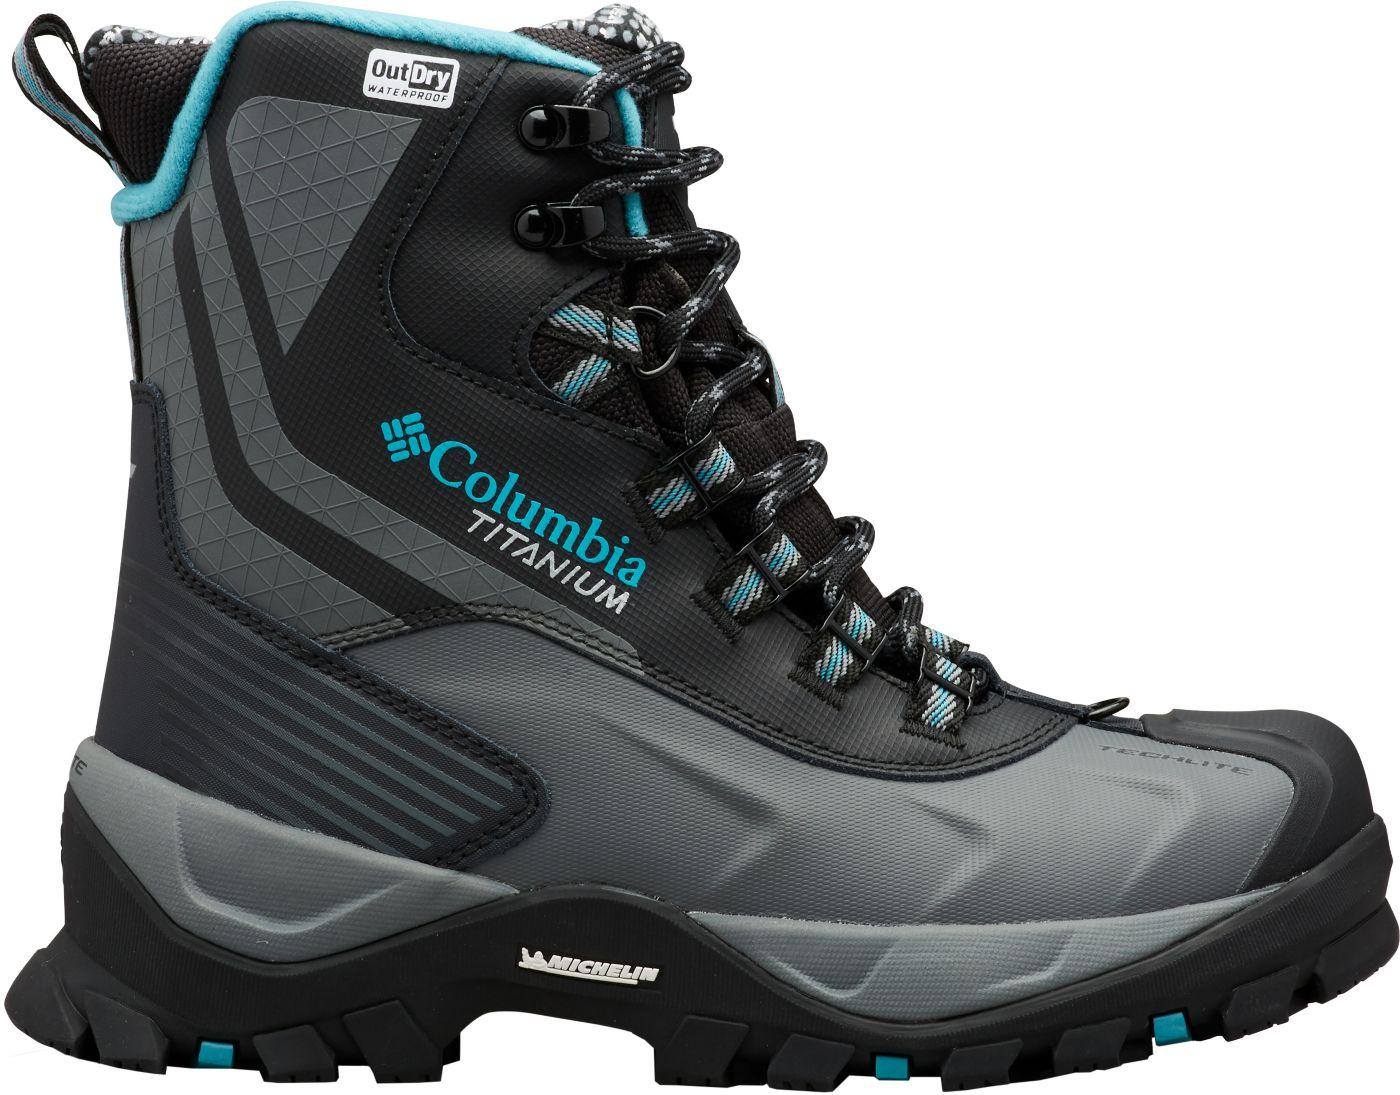 Columbia Women's Powderhouse Titanium Omni-Heat 3D OutDRY 600g Waterproof Winter Boots